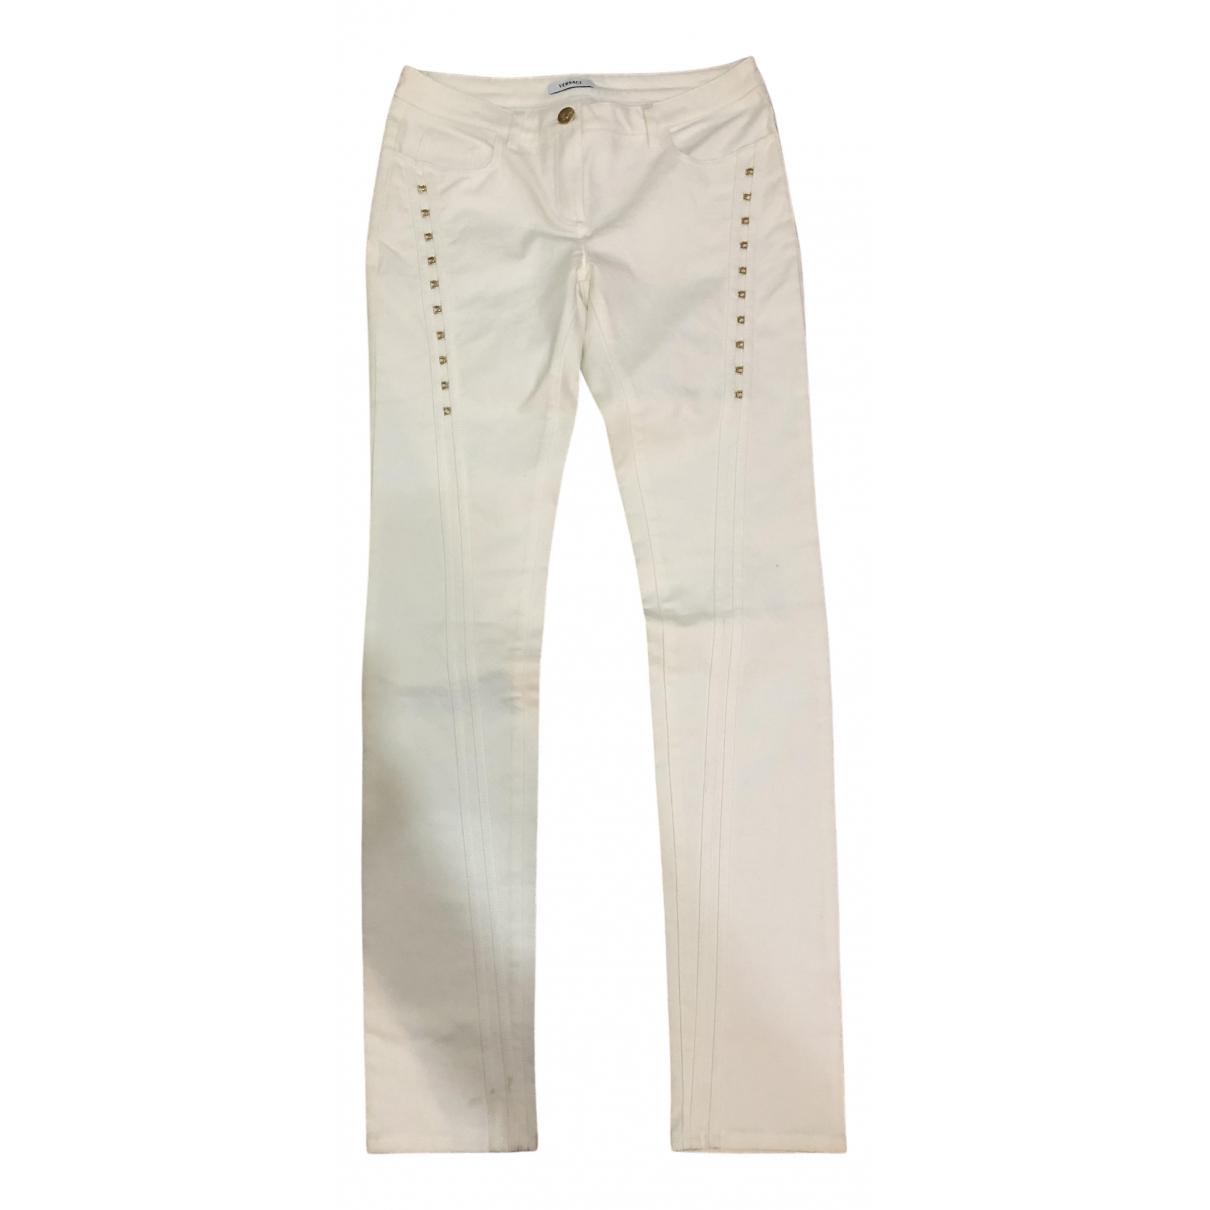 Versace N White Denim - Jeans Jeans for Women 30 US